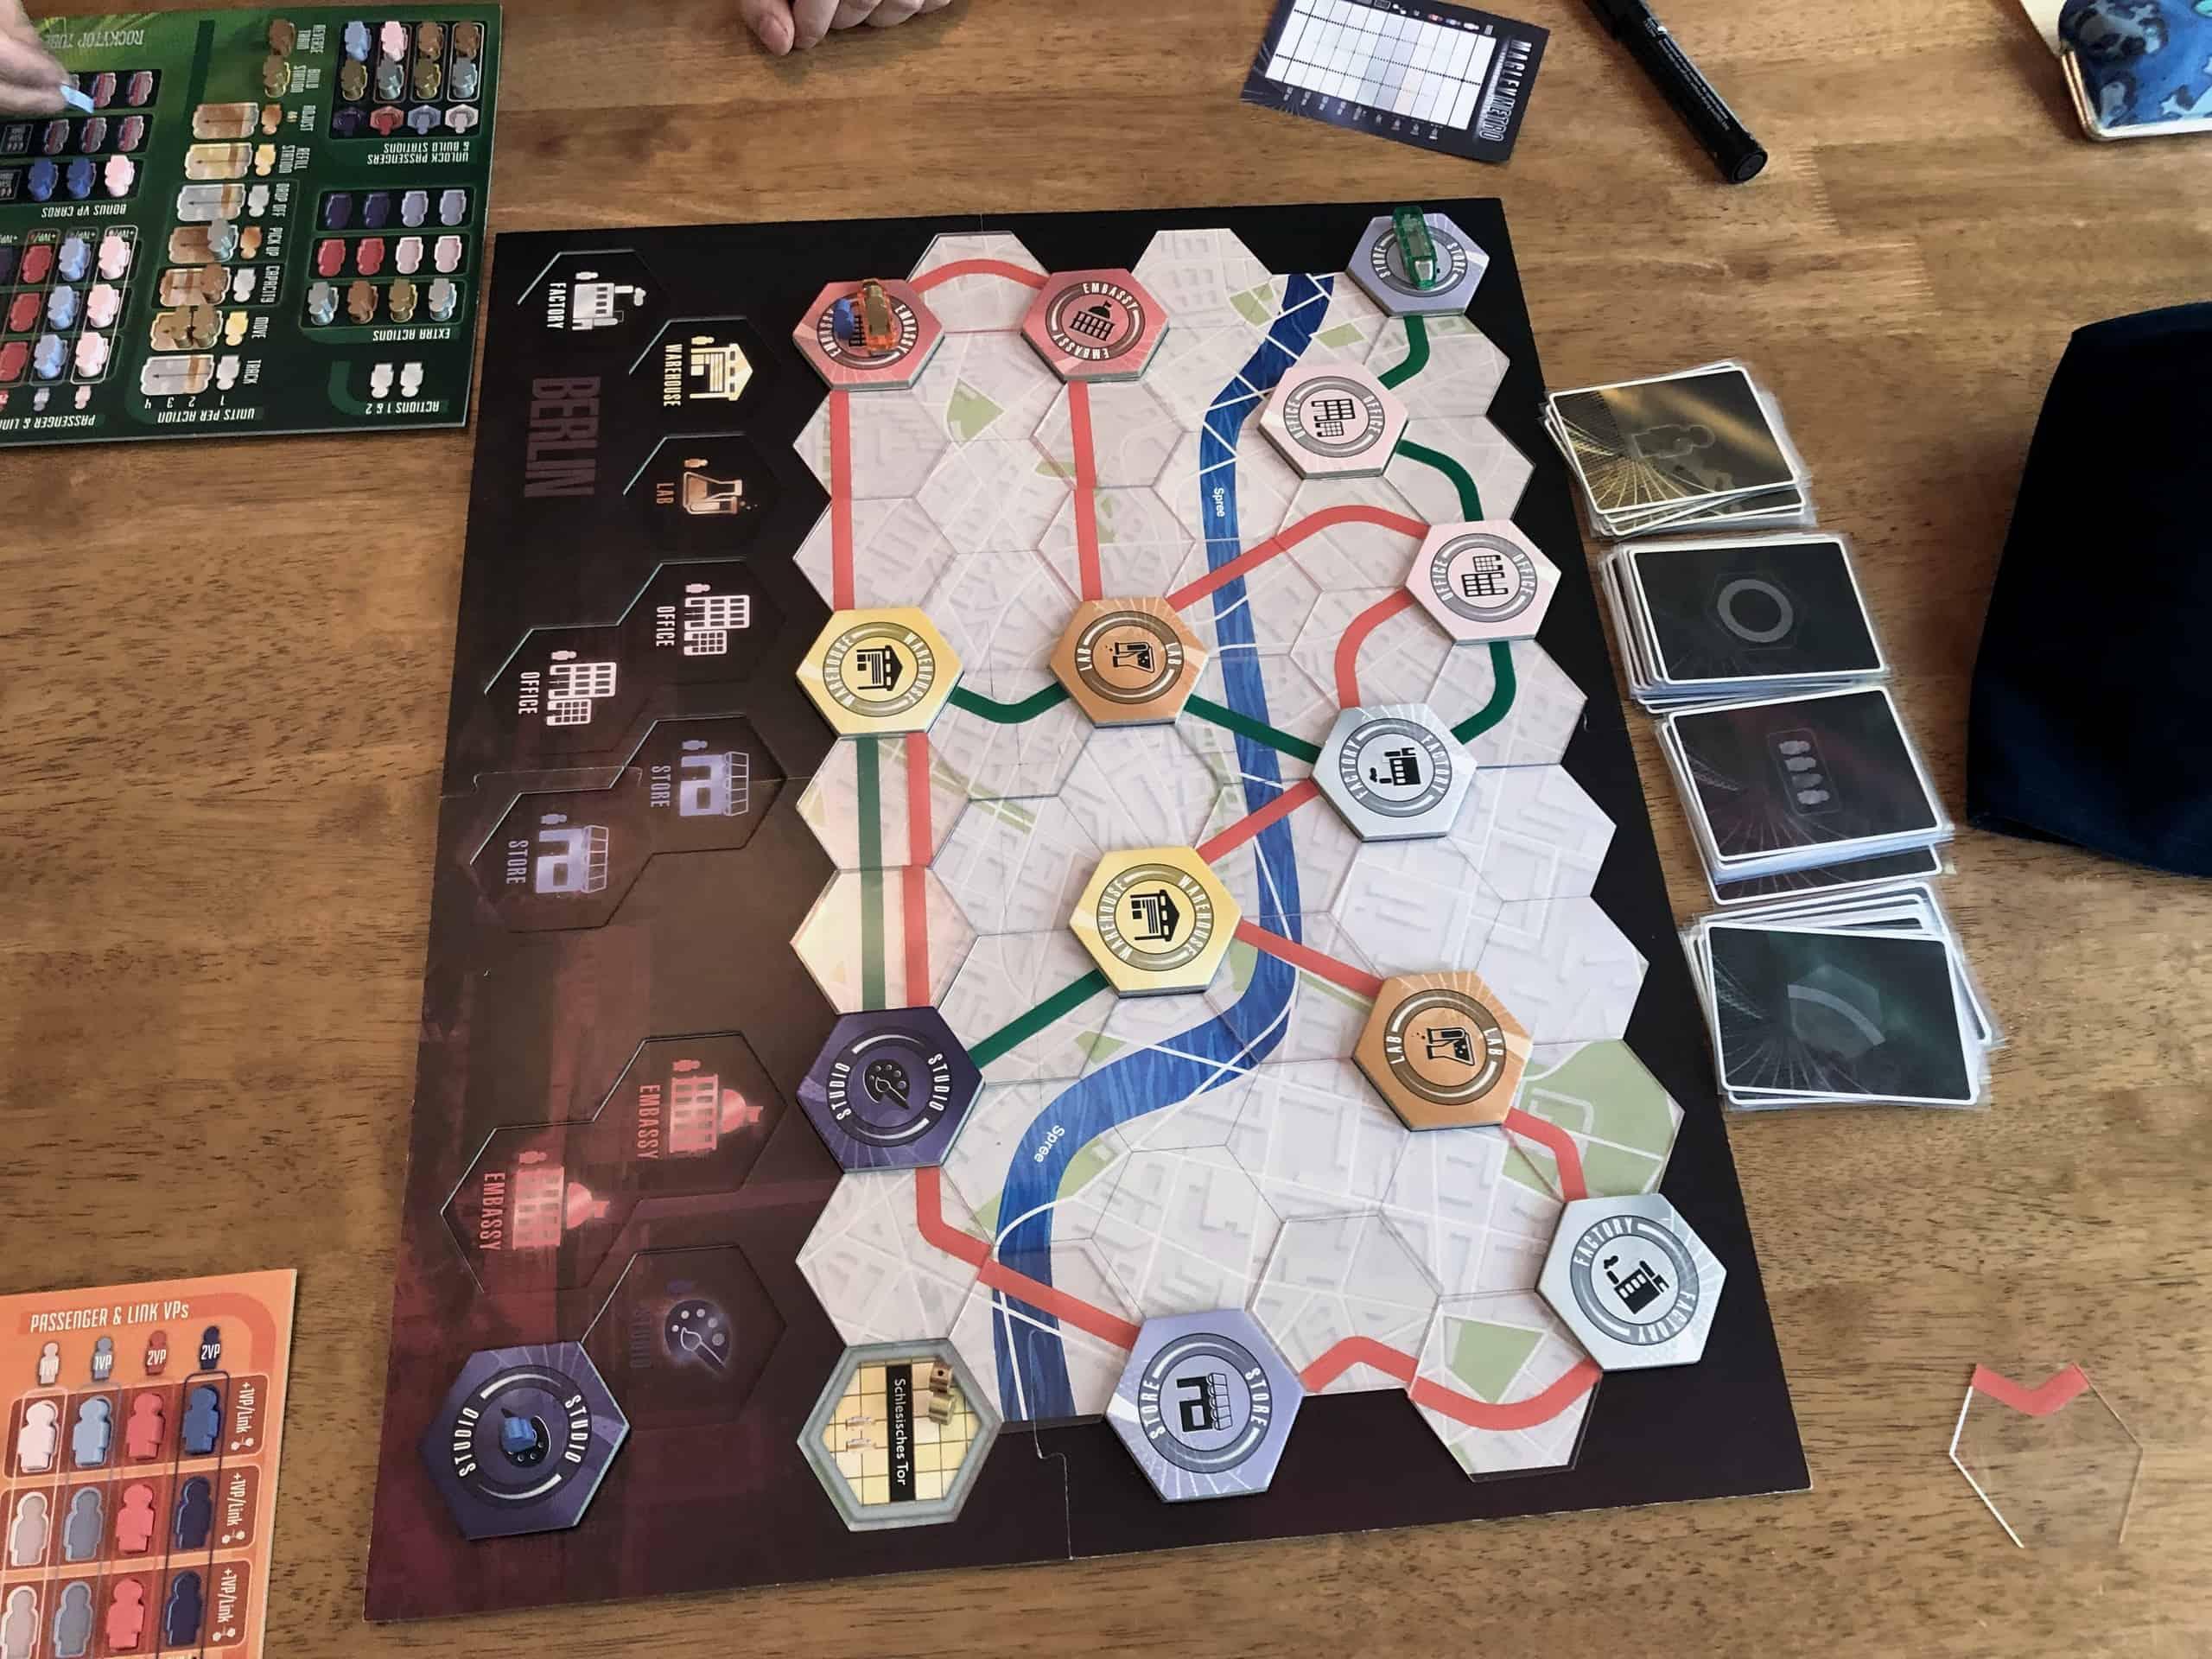 Maglev Metron pelilauta pelin lopussa